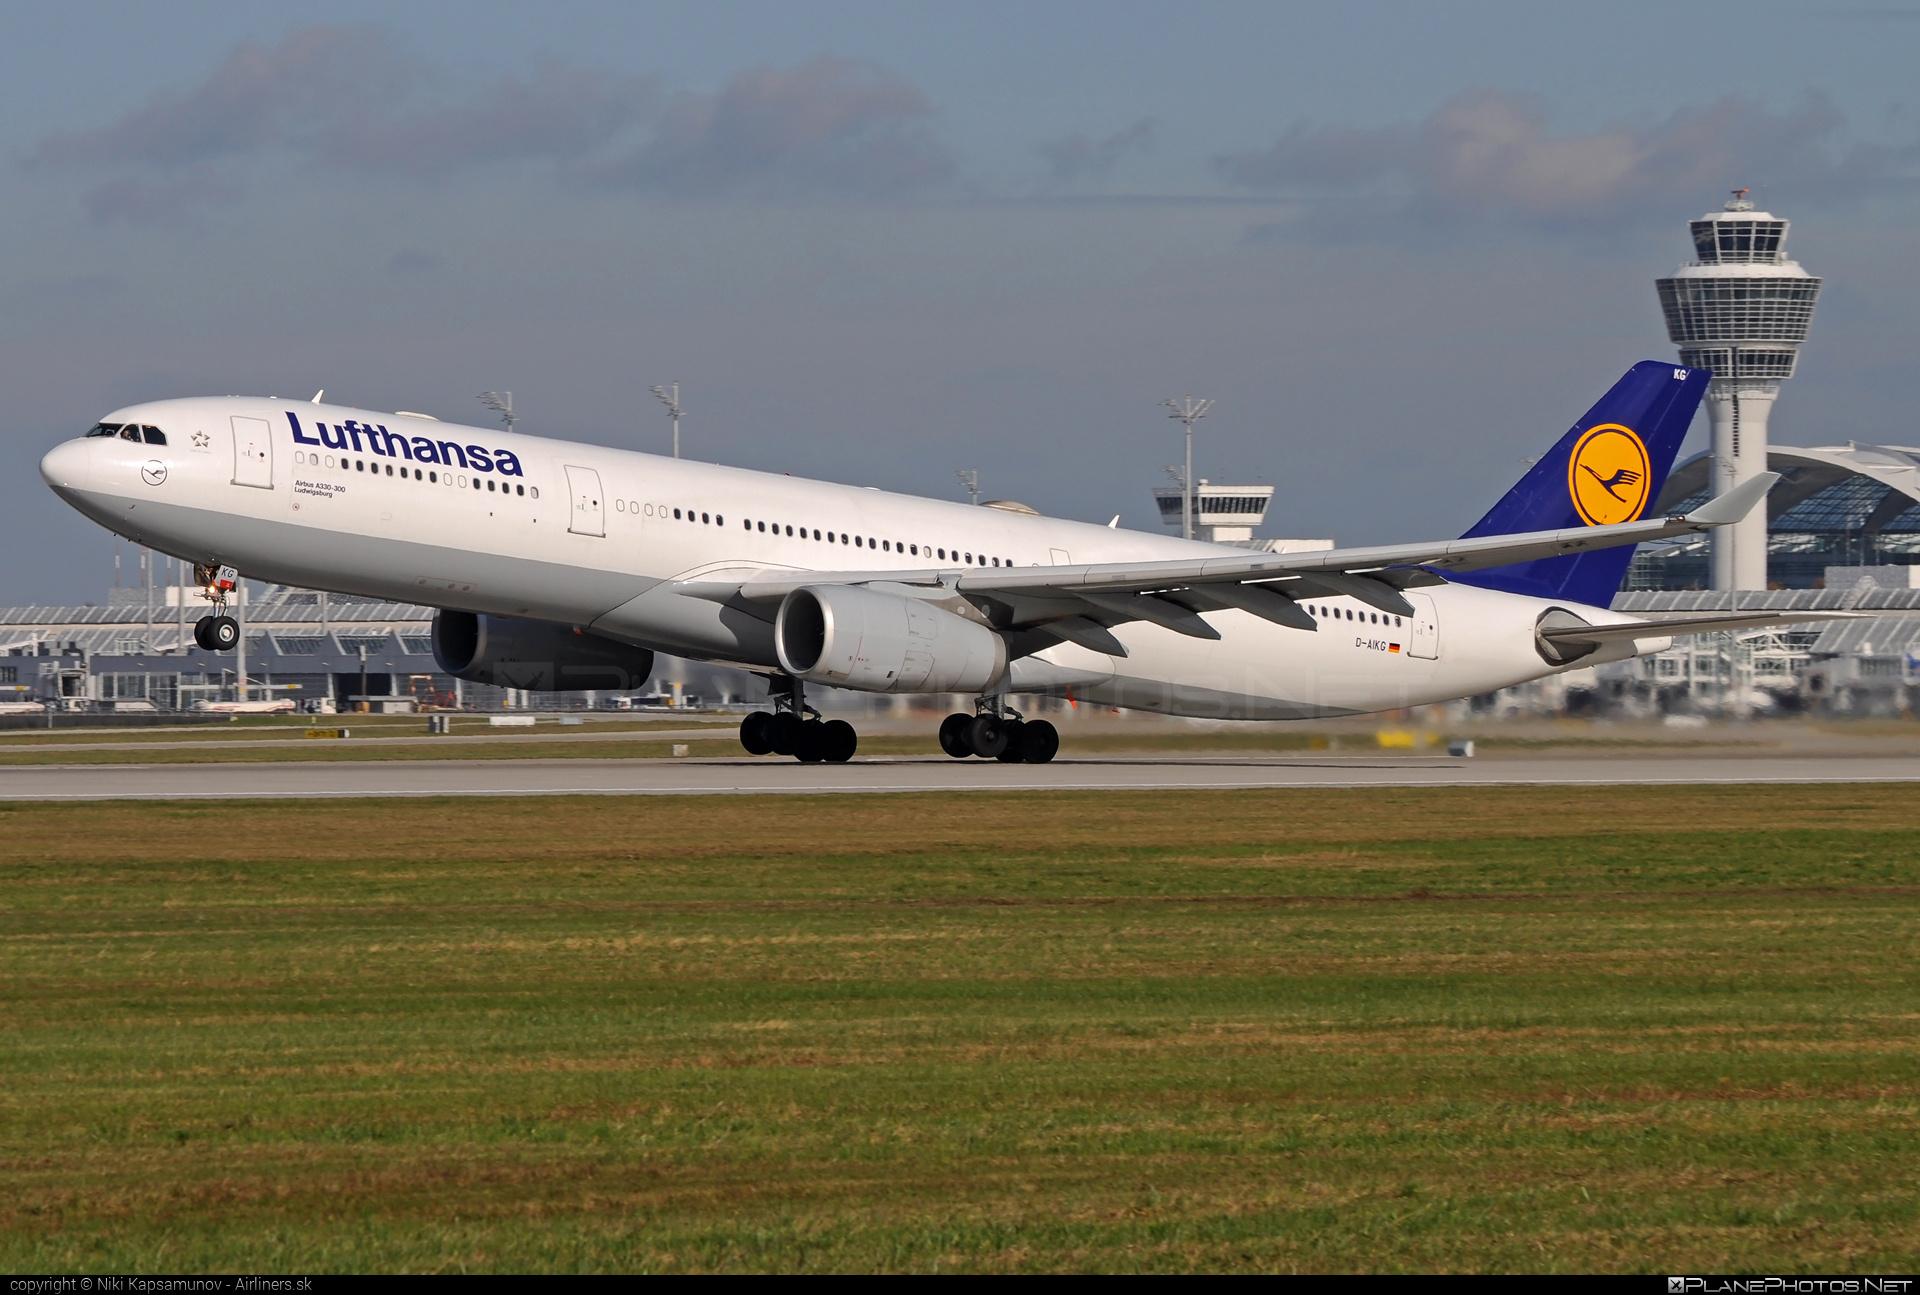 Airbus A330-343 - D-AIKG operated by Lufthansa #a330 #a330family #airbus #airbus330 #lufthansa